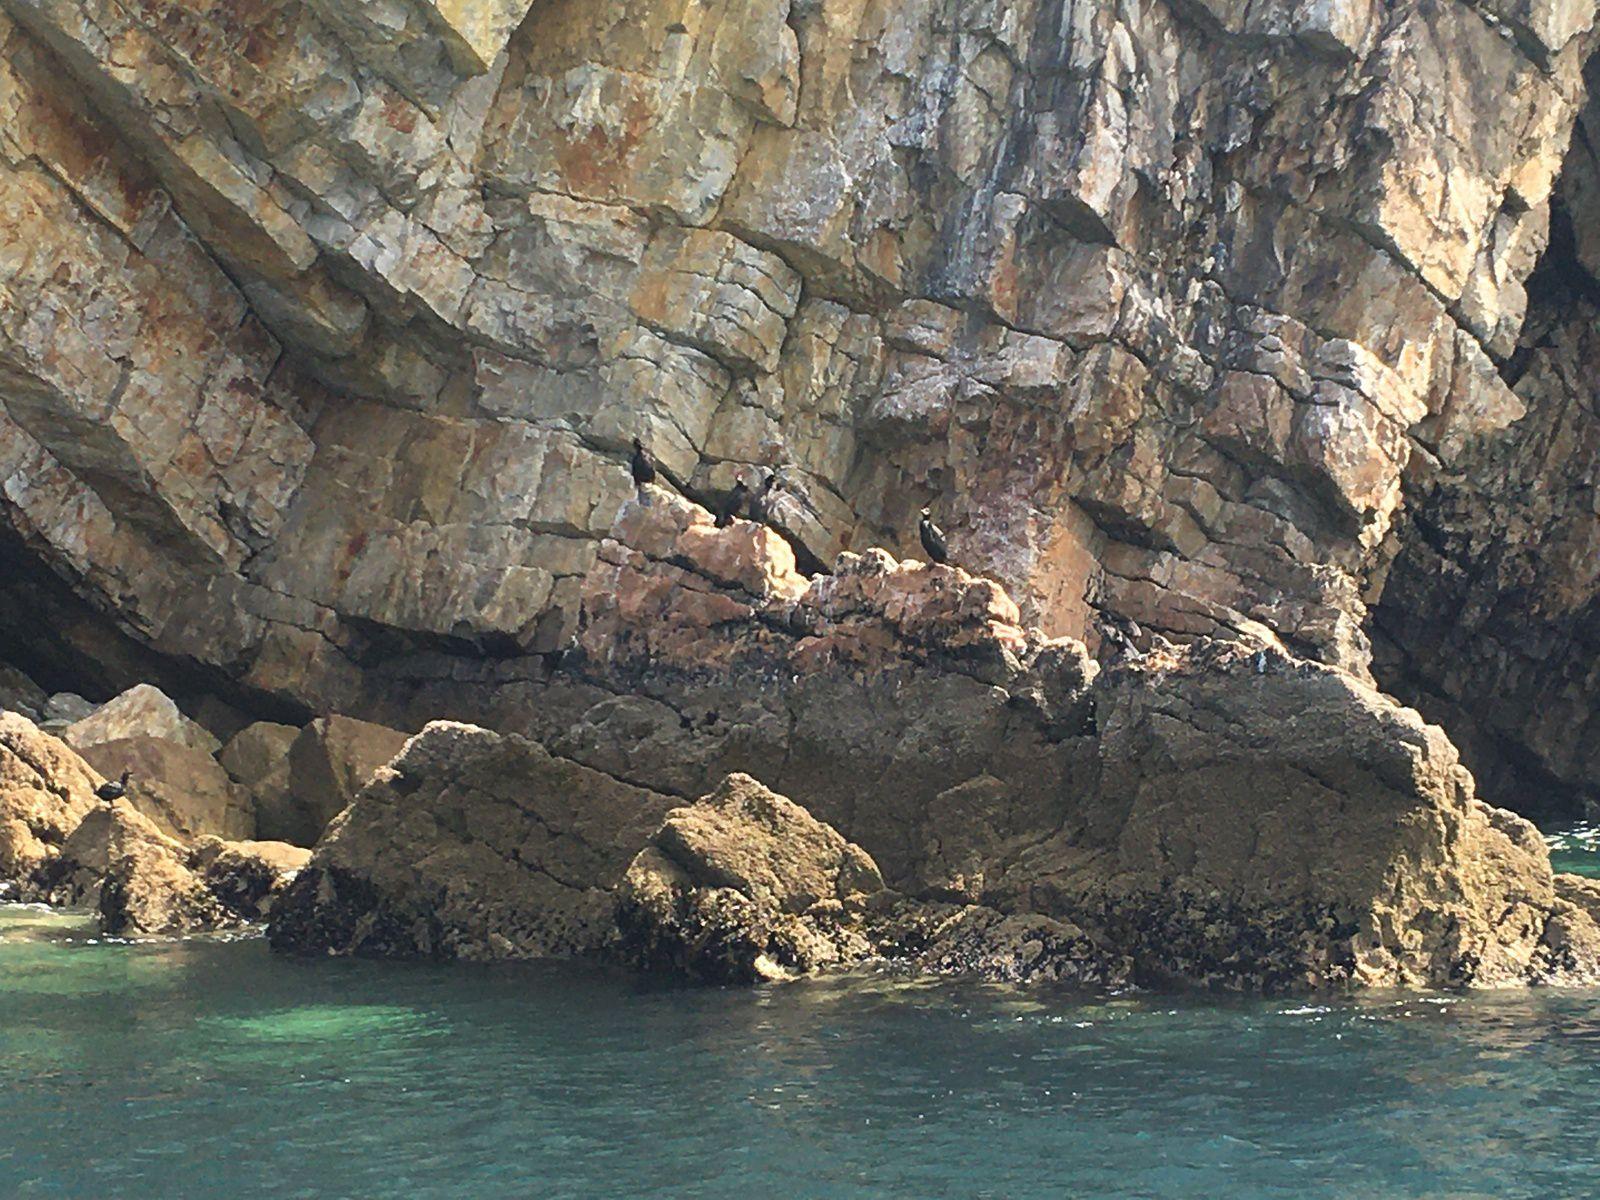 16 juin 2021 : Grottes marines / Cap de la chèvre